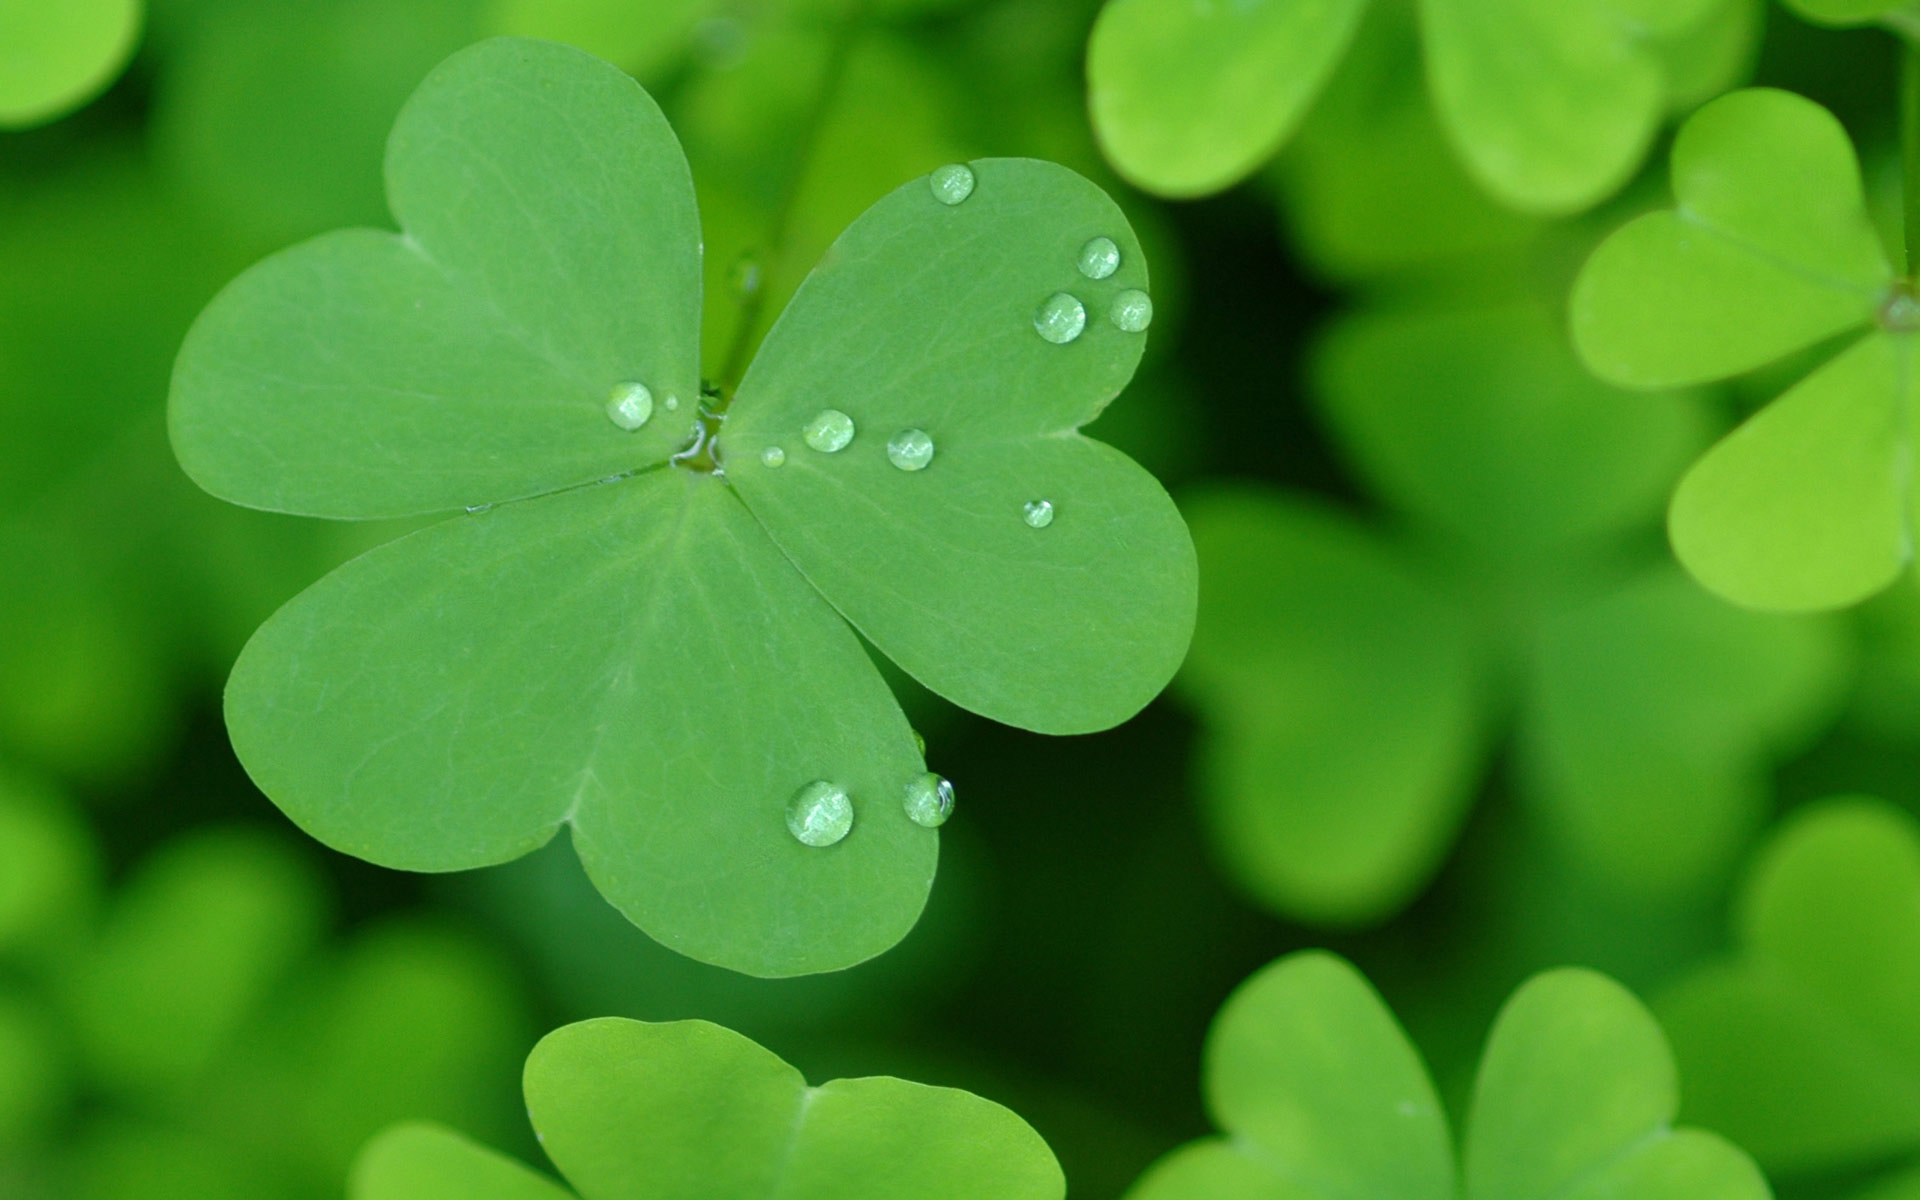 Happy St Patrick's Day 2014 wallpaper - 1294428